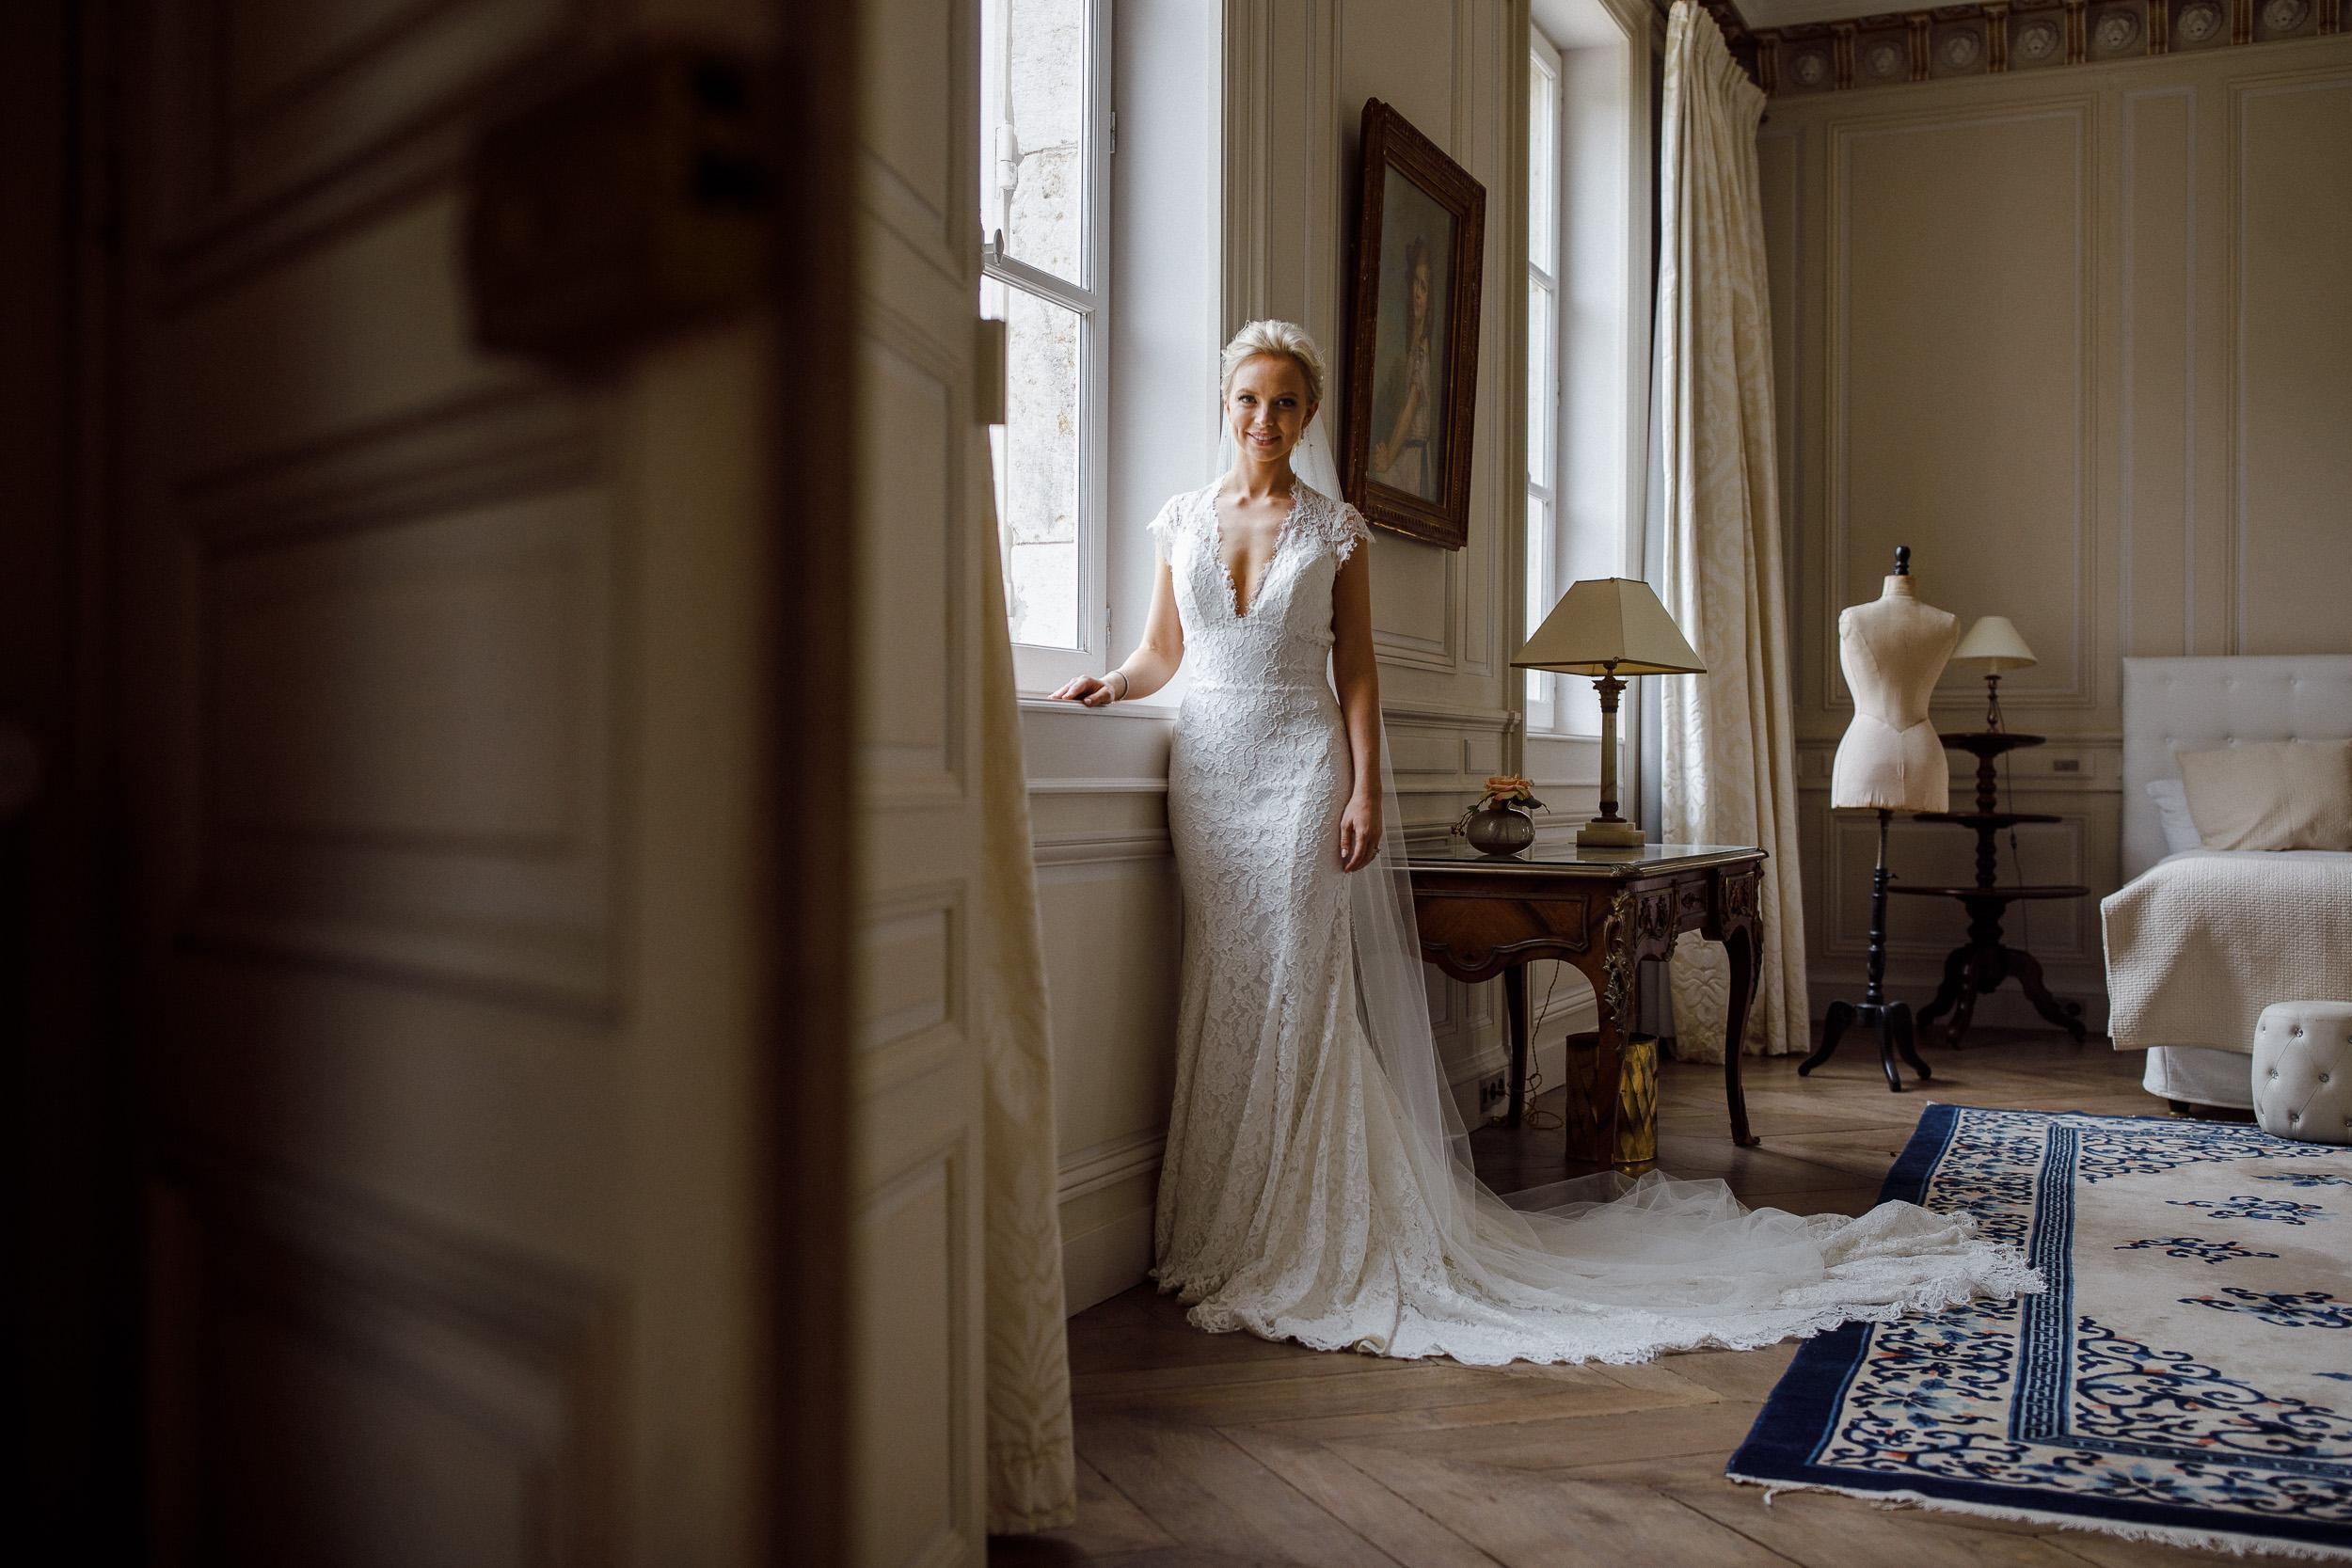 Wedding-Chateau-de-Varennes-039.jpg